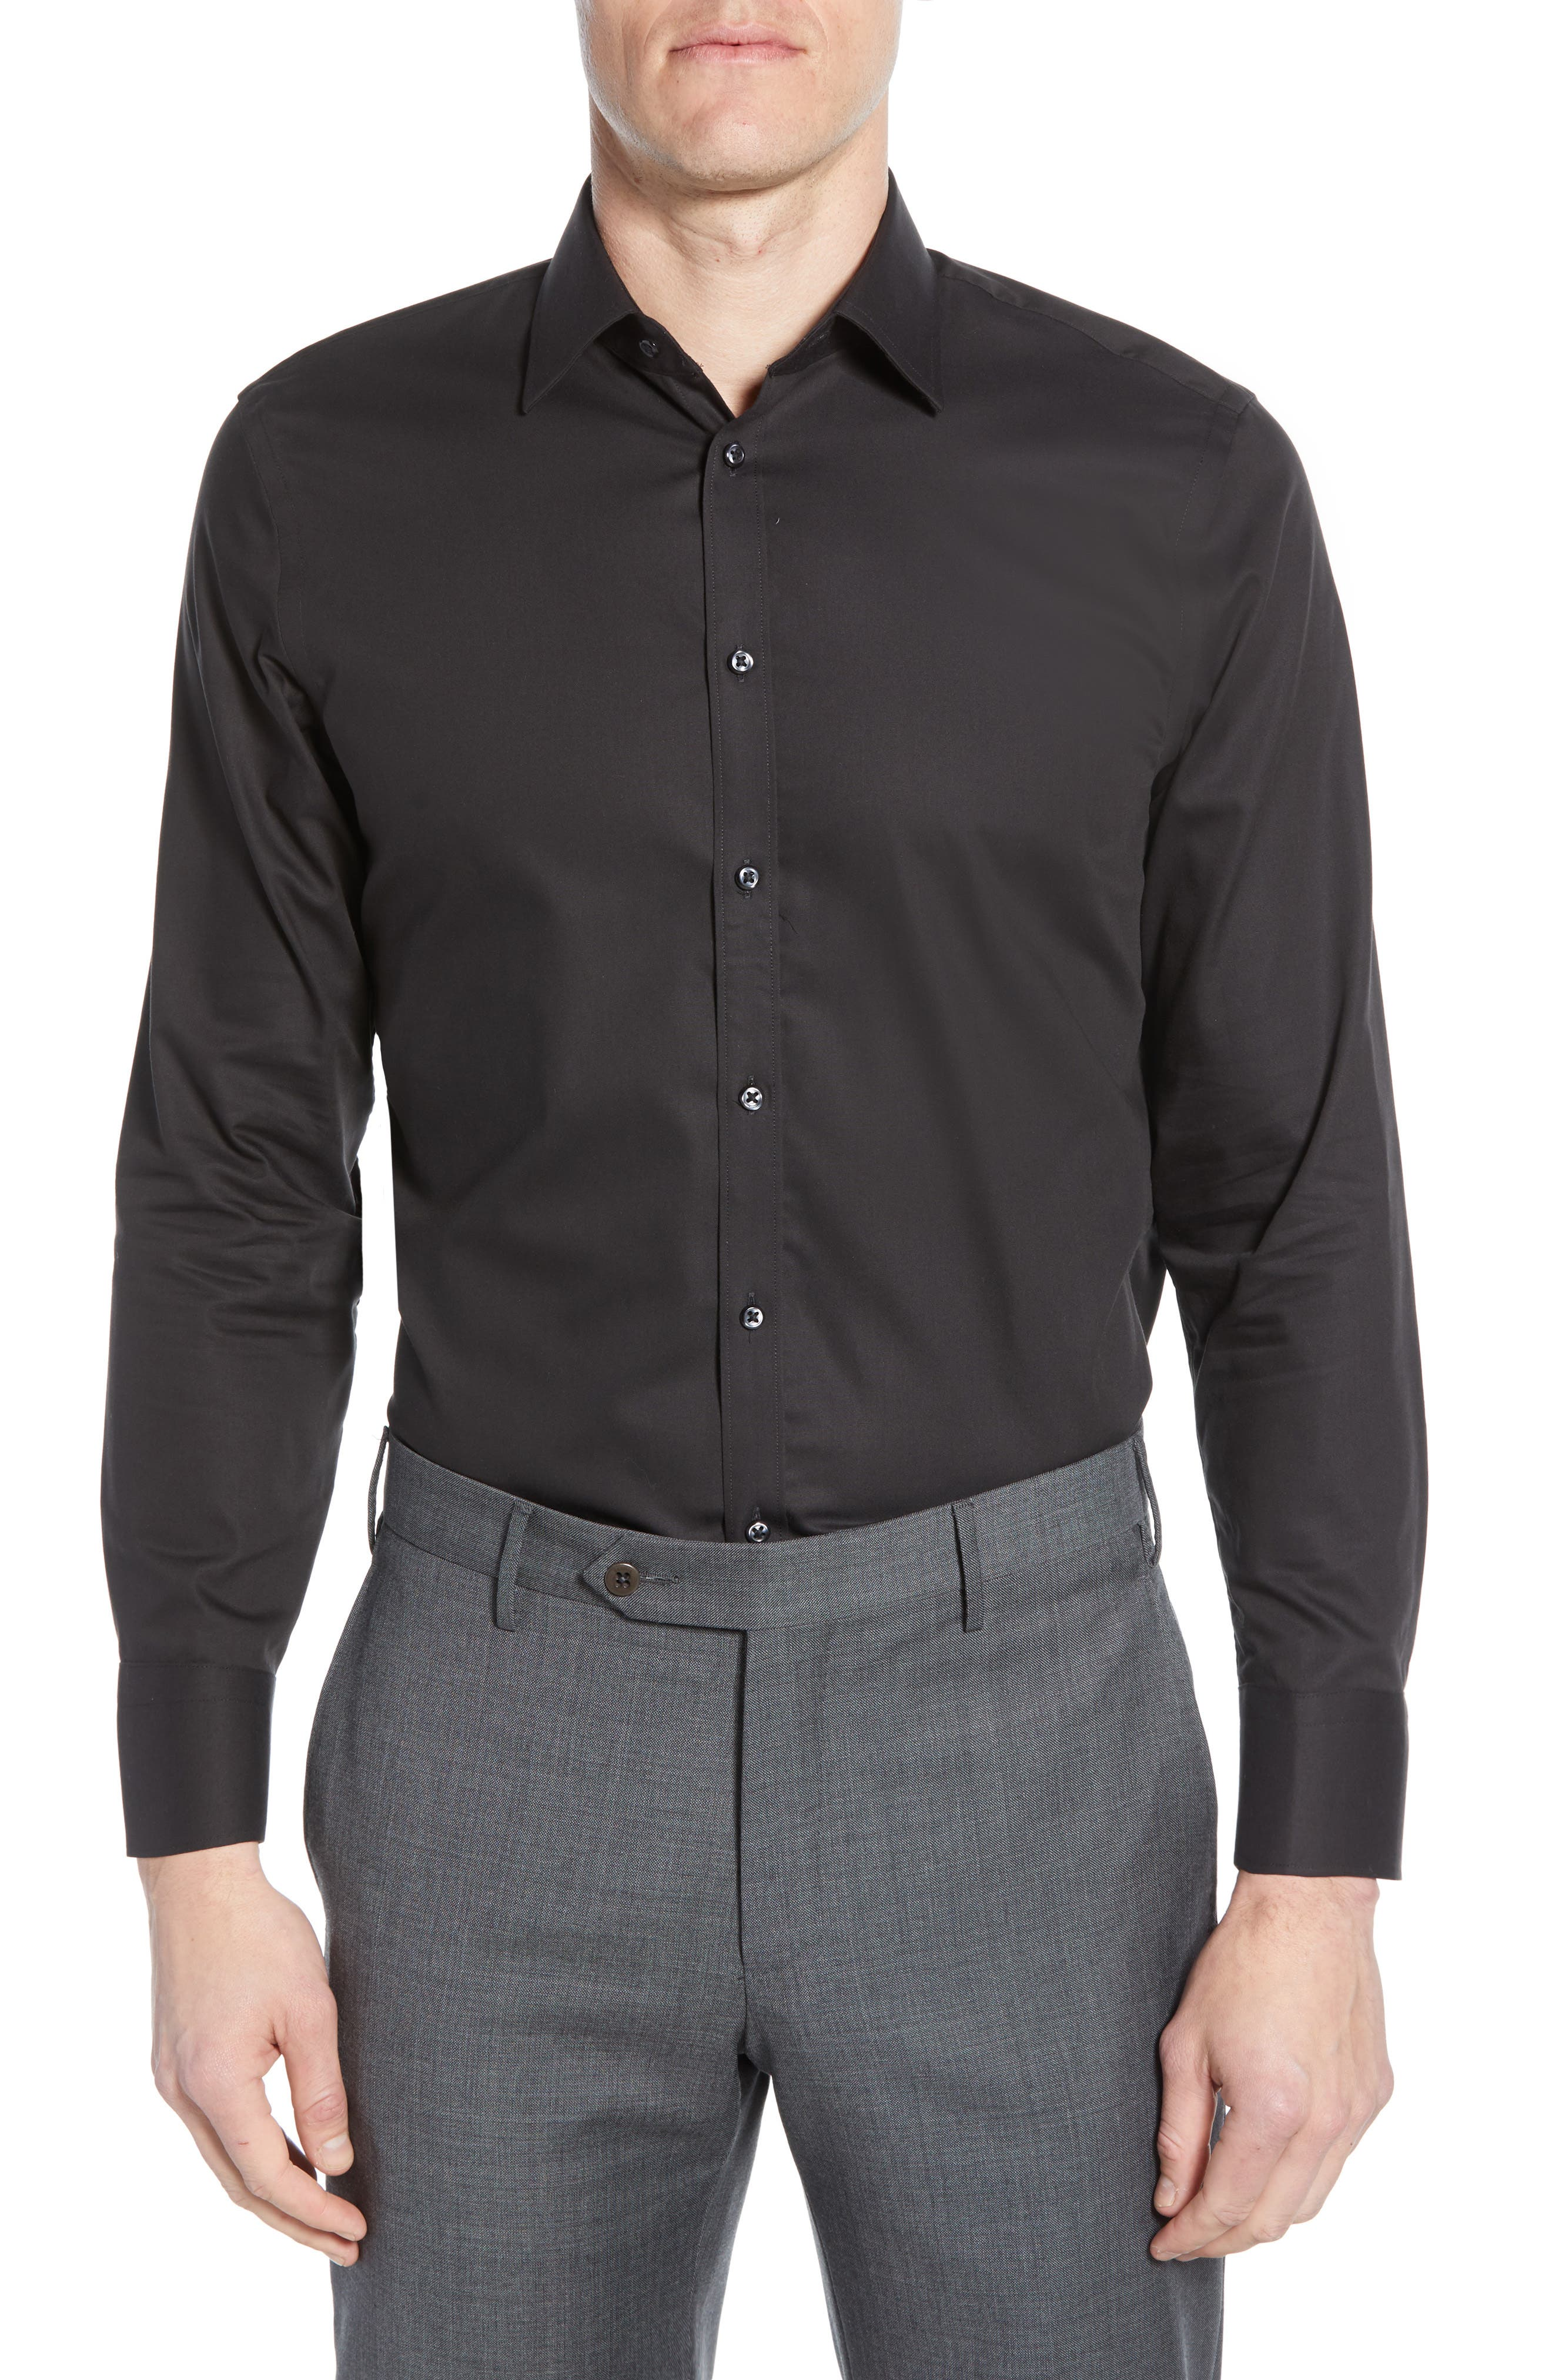 NORDSTROM MEN'S SHOP Extra Trim Fit Non-Iron Solid Dress Shirt, Main, color, BLACK ROCK